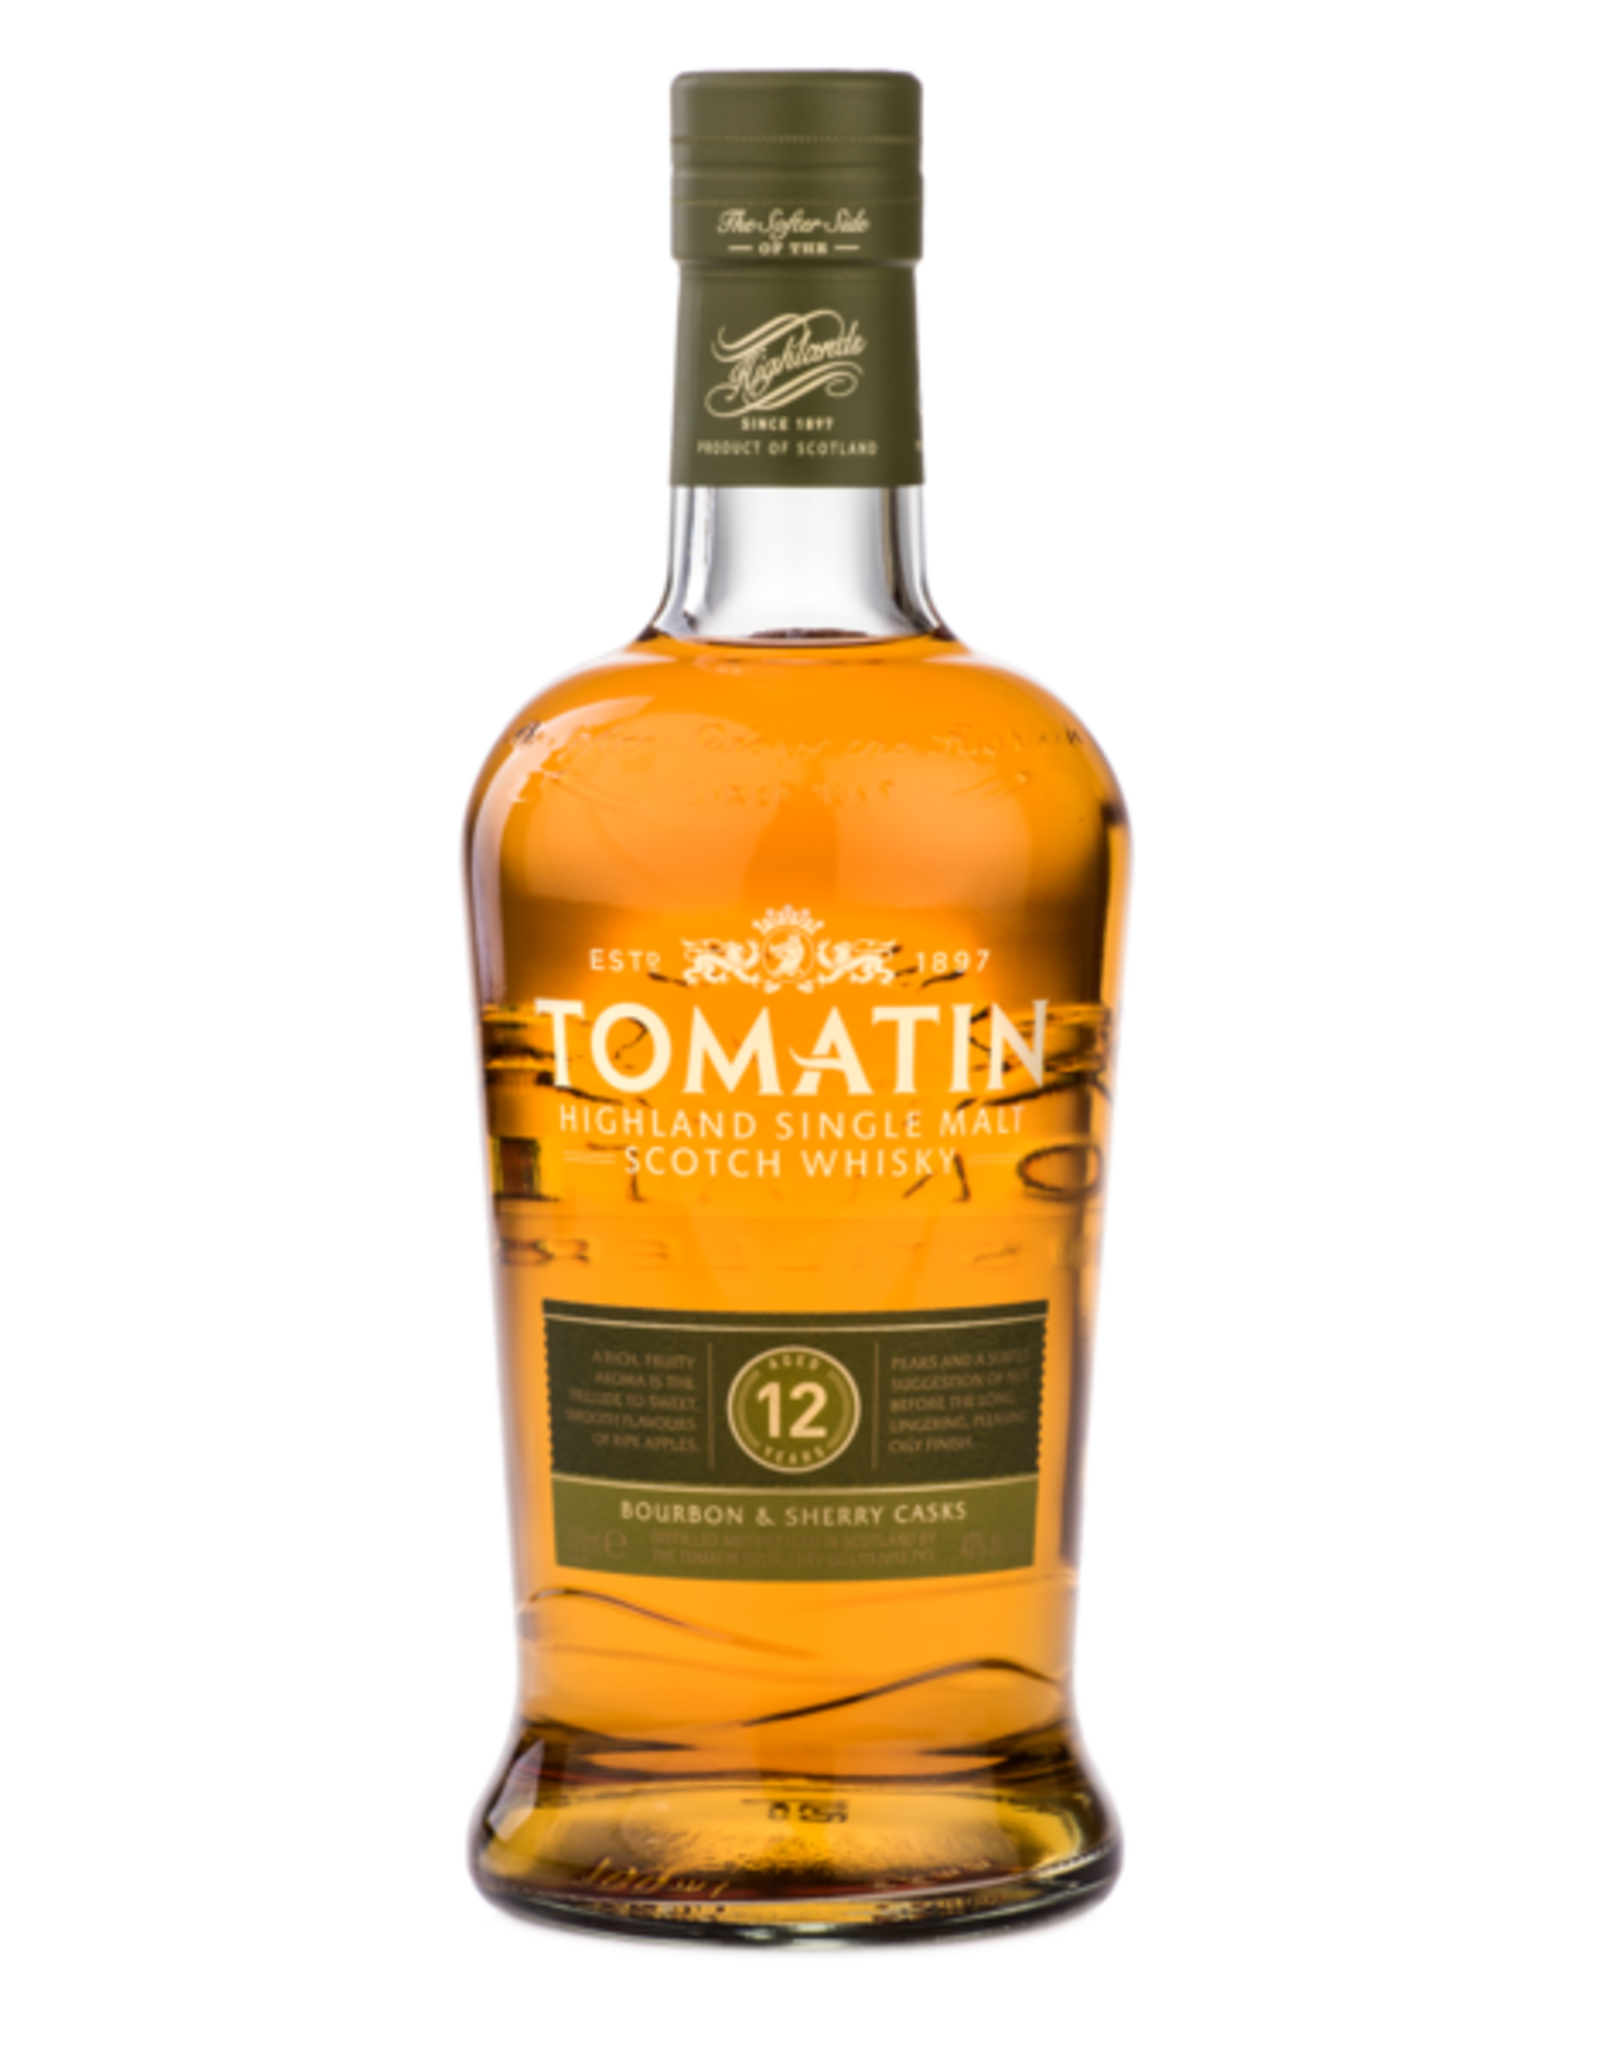 Tomatin Single Malt Scotch Whiskey 12 Year